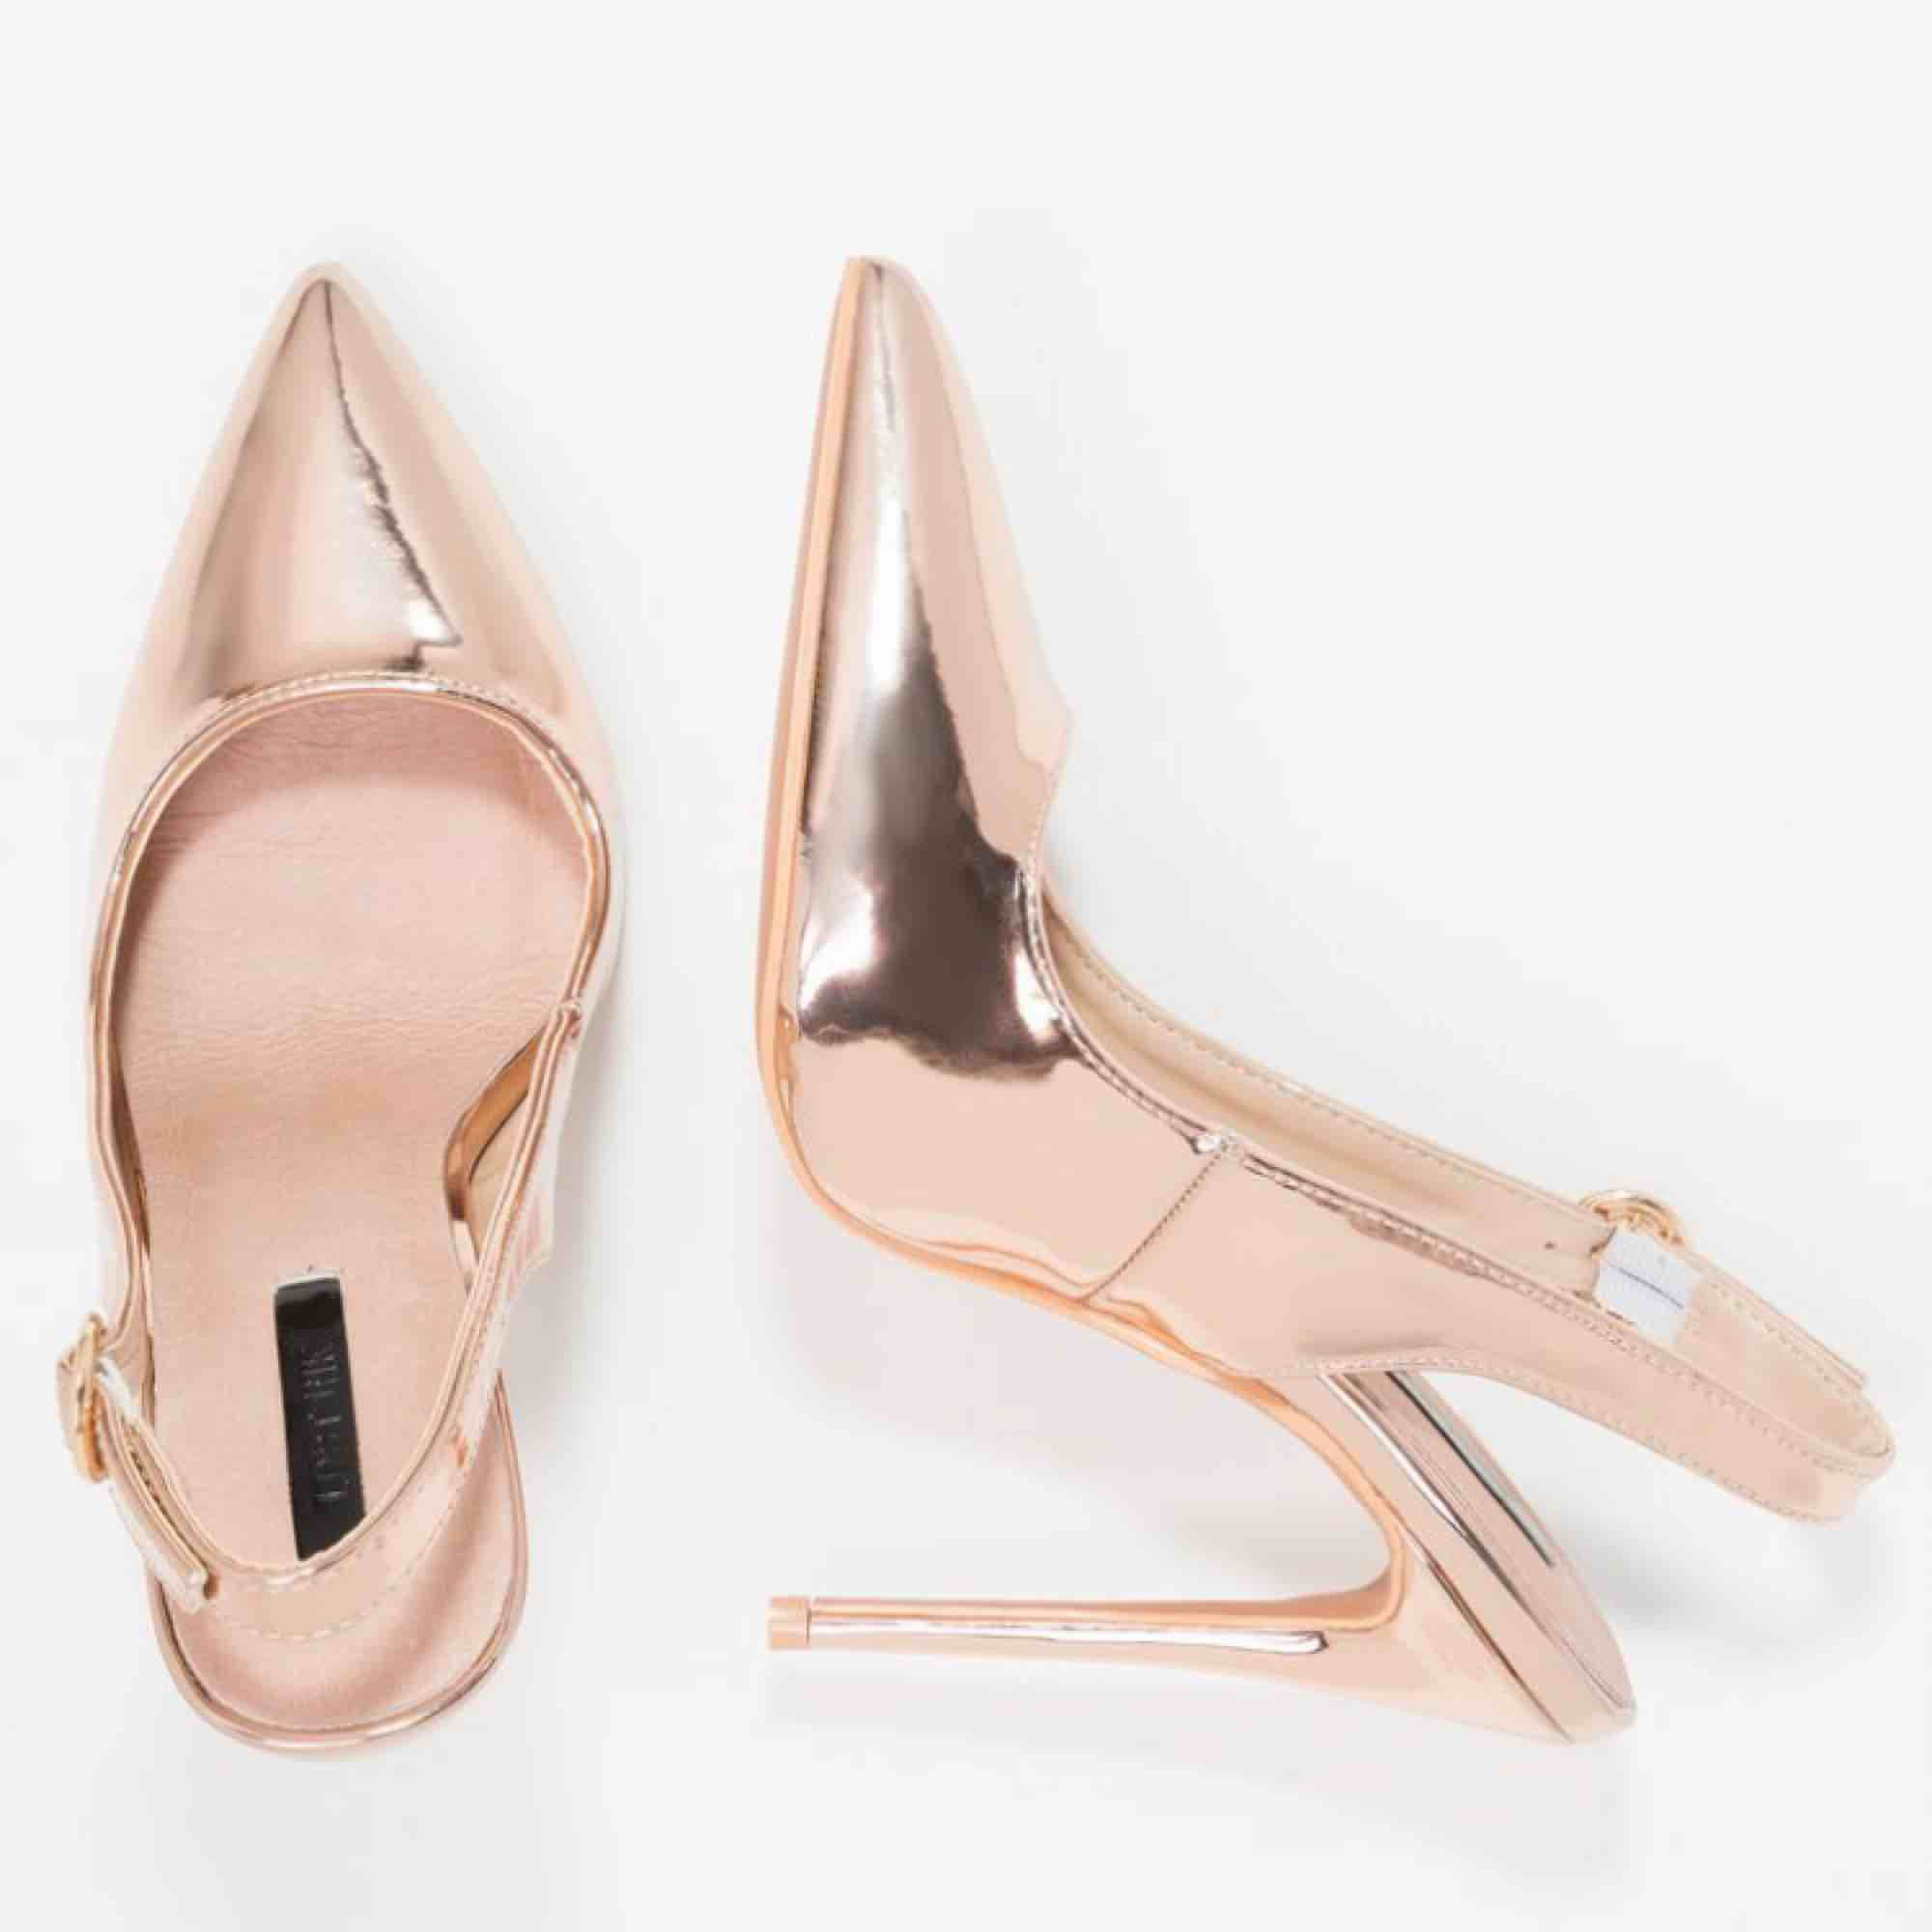 Metallic Rose Gold Shoes Pointed Toe heels sise 36. Skor.